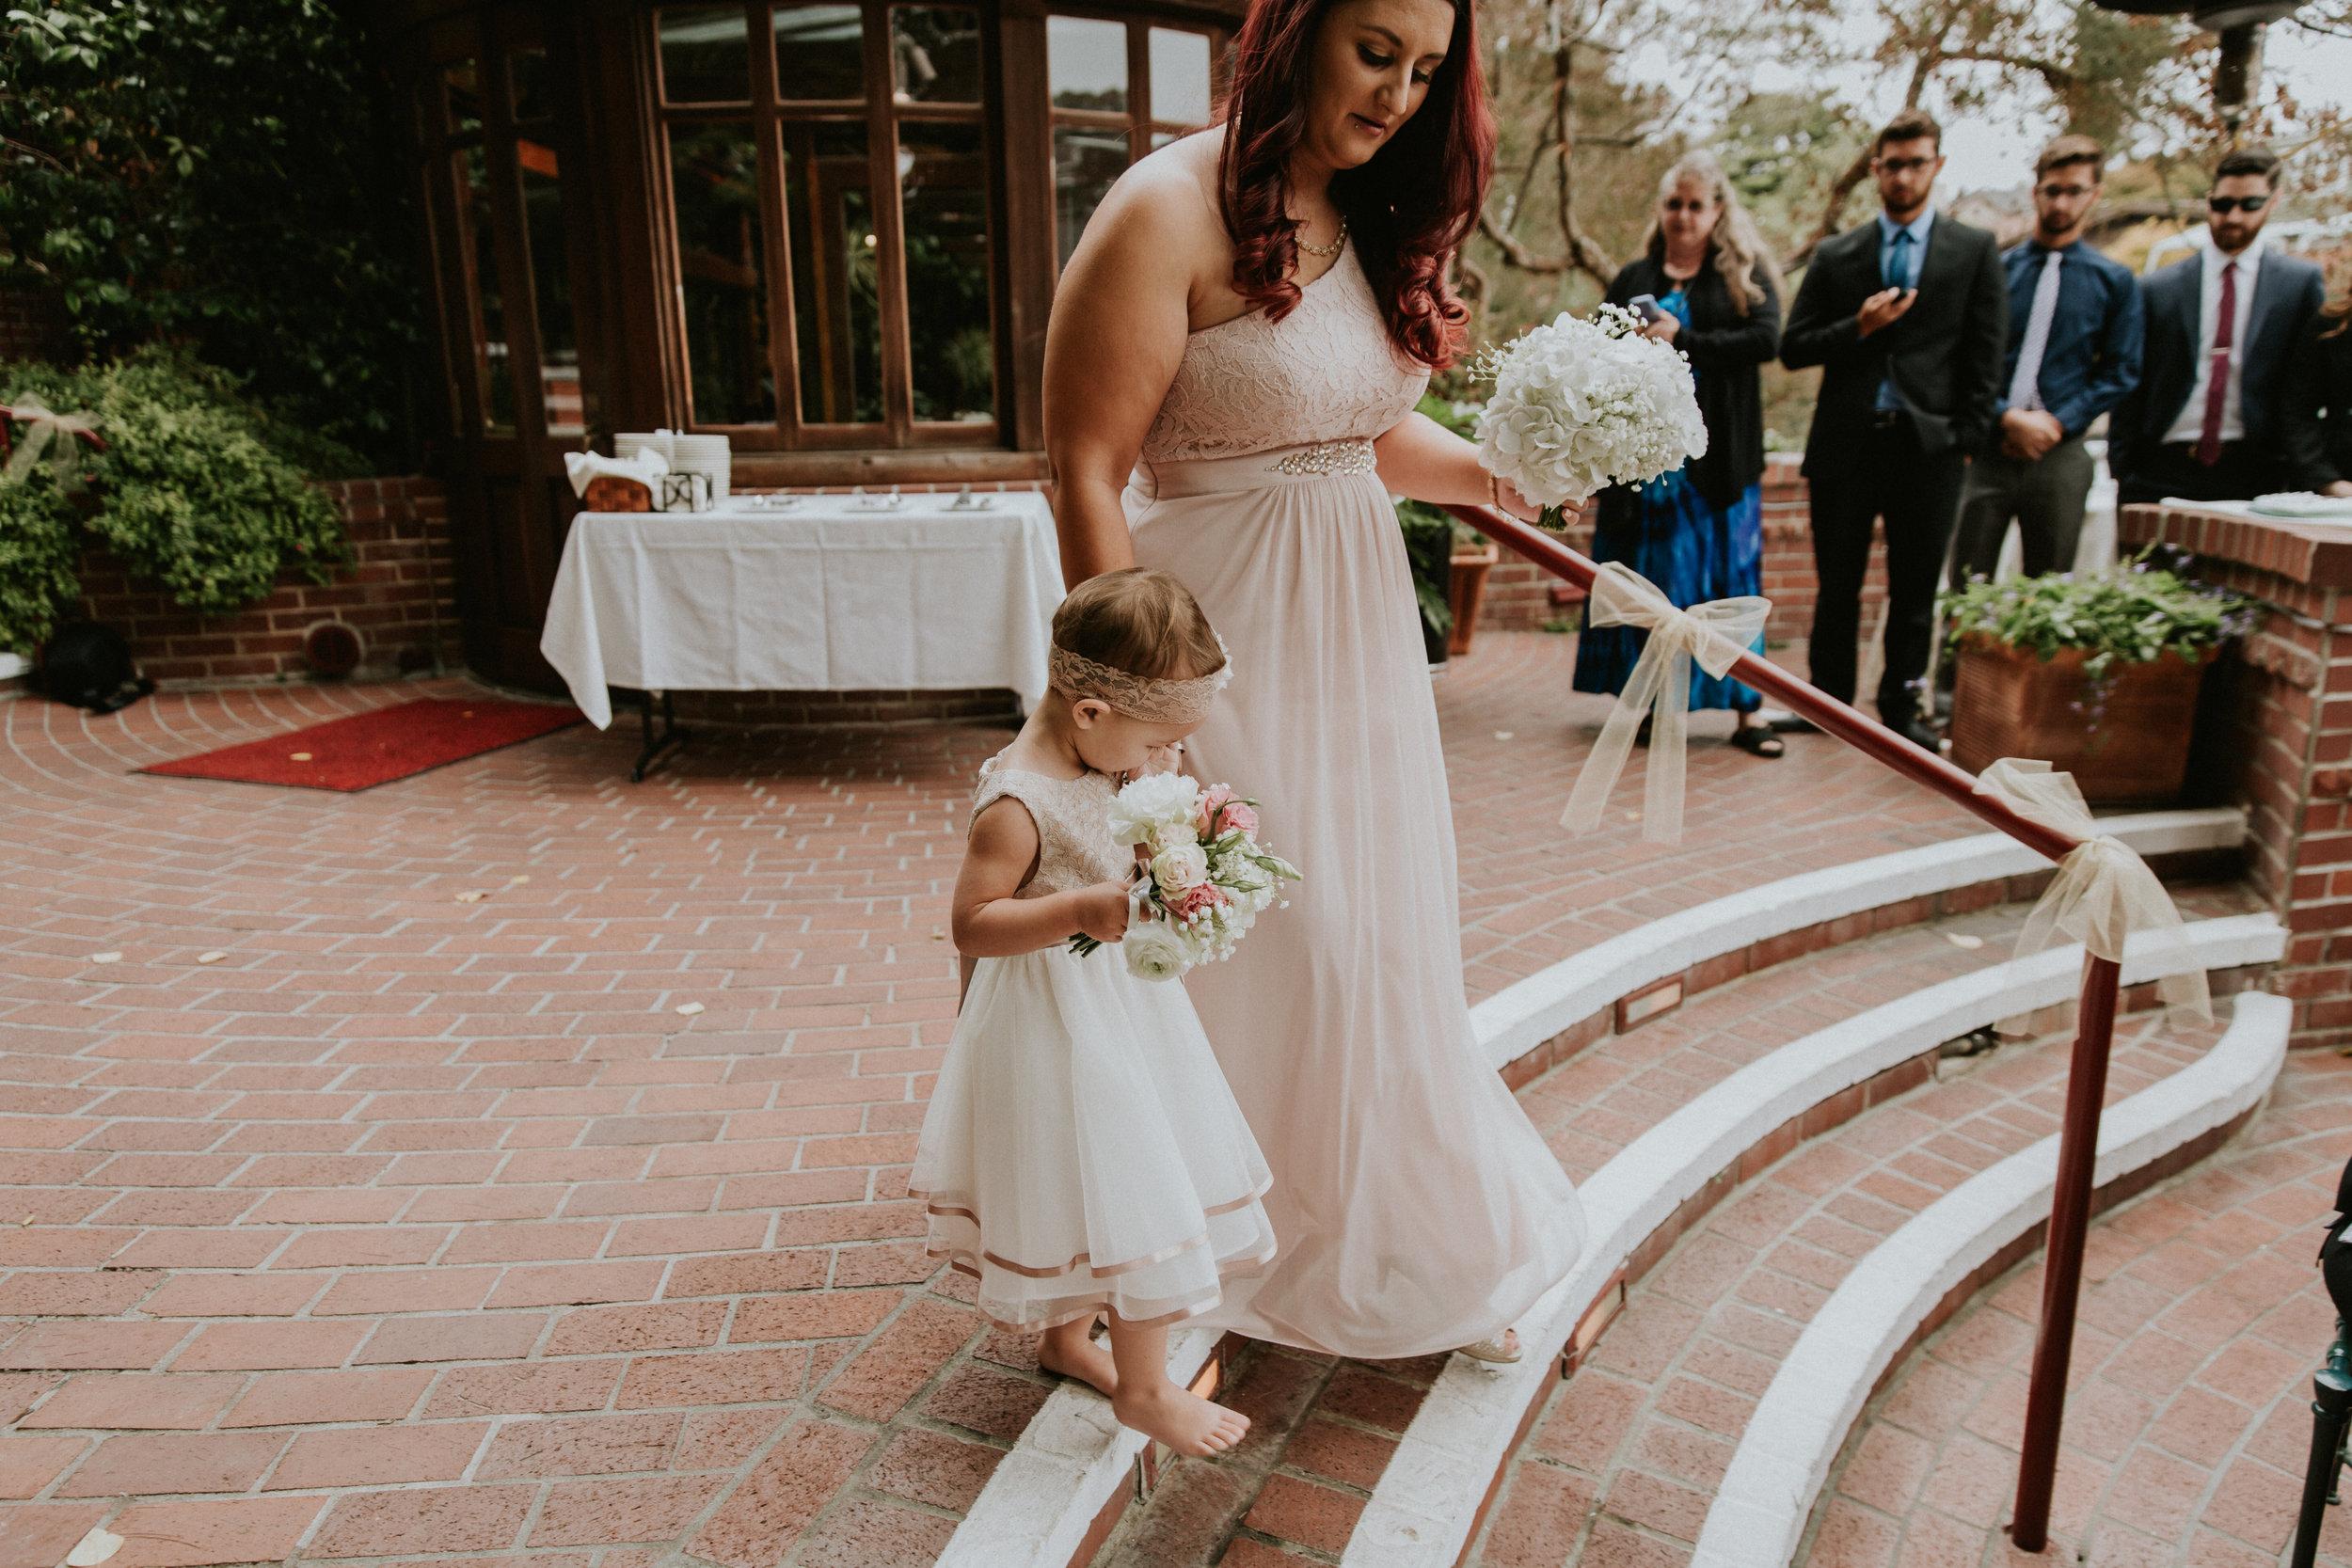 Capitola-Santa-Cruz-wedding-photographer-133.jpg